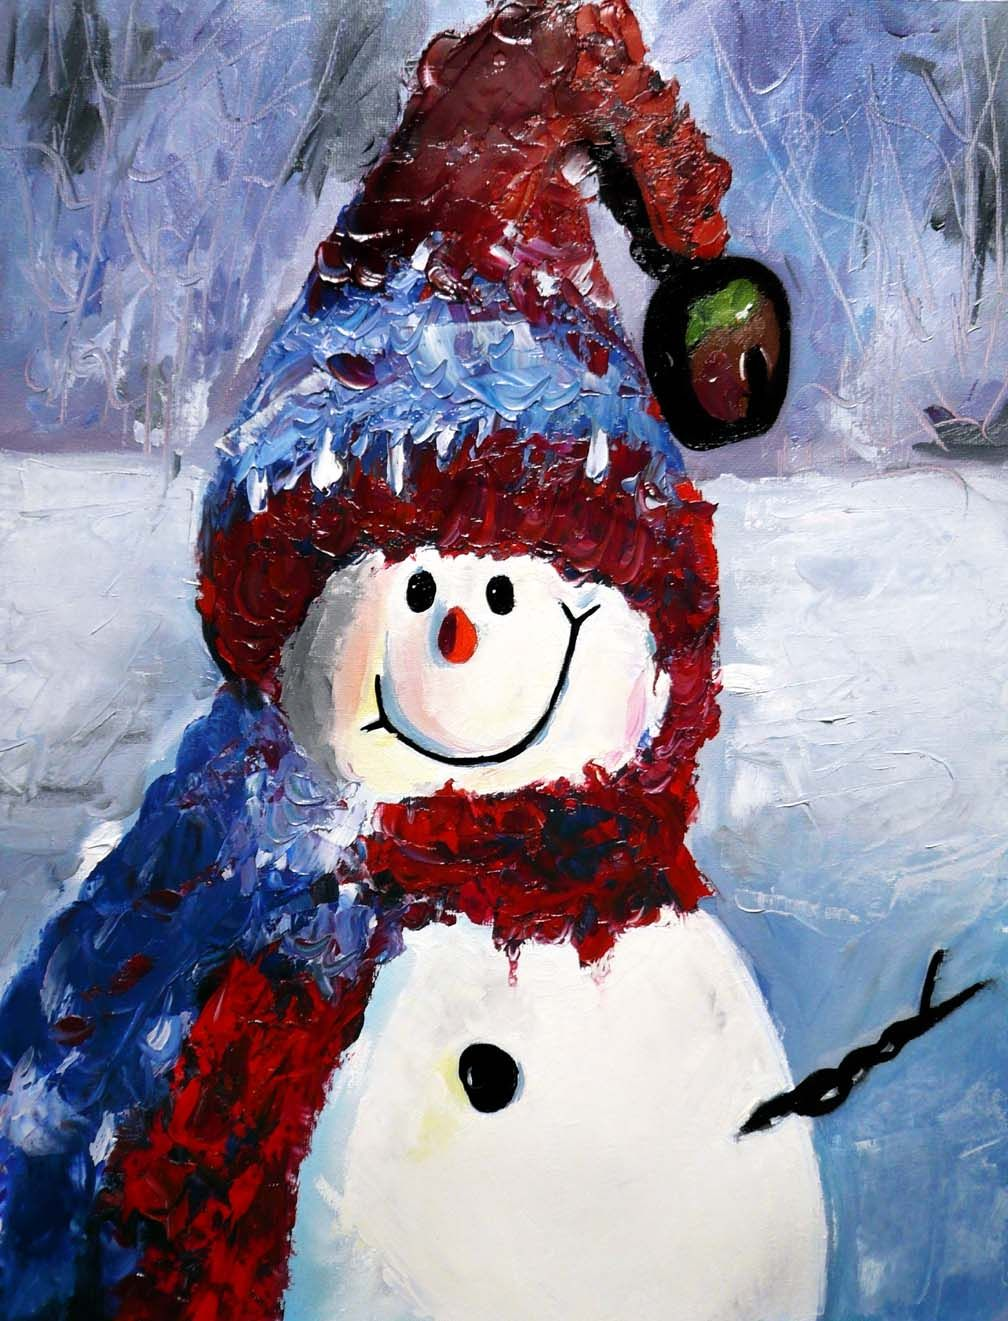 Snowman Paintings On Canvas | Happy snowman | Canvas ...